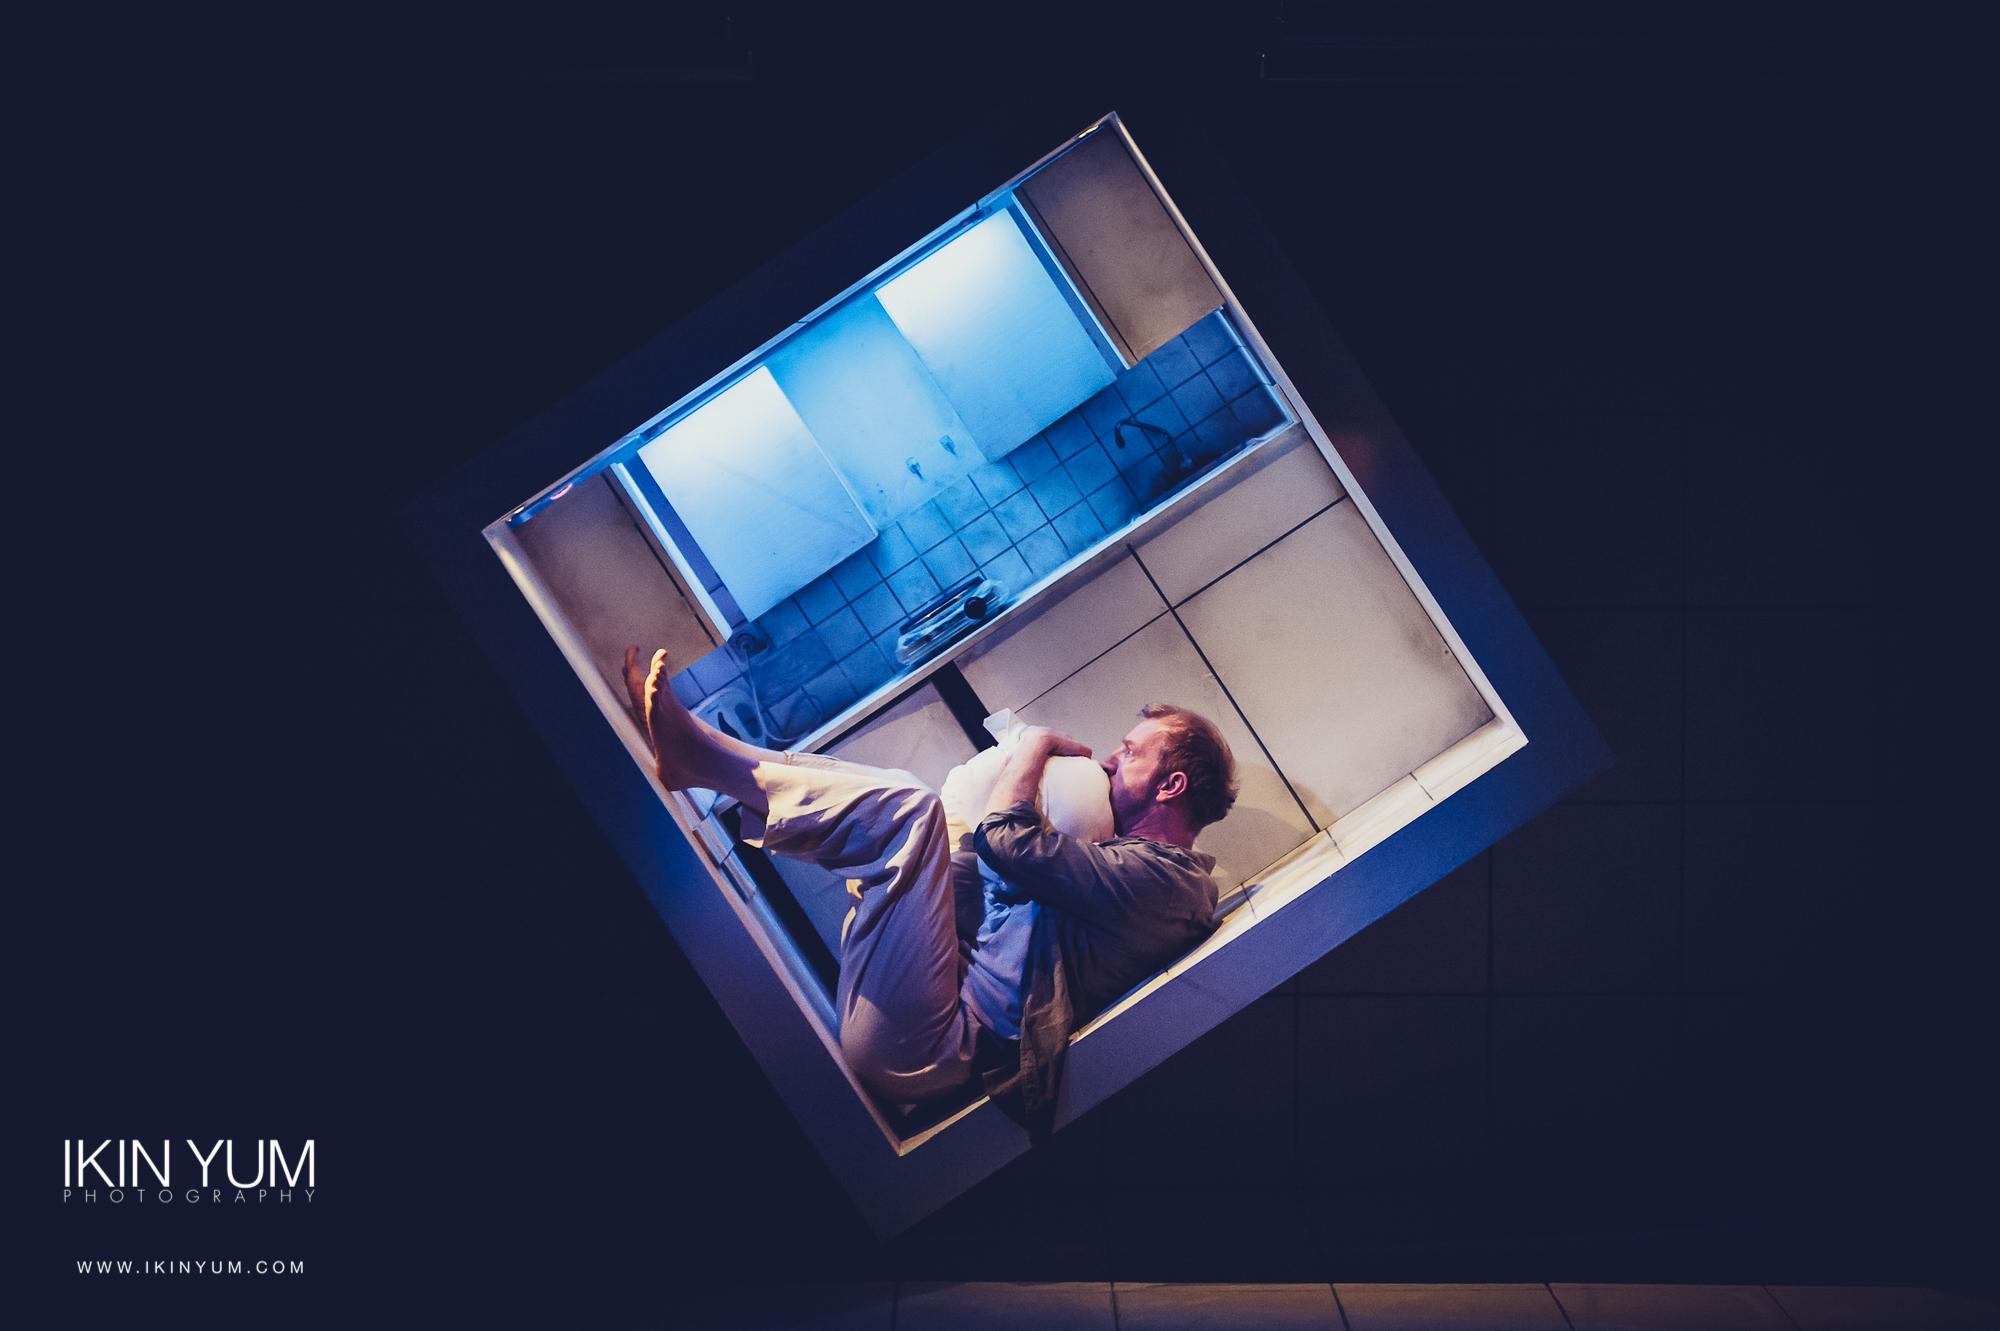 Goya - Gate theatre - Ikin Yum Photography-008.jpg